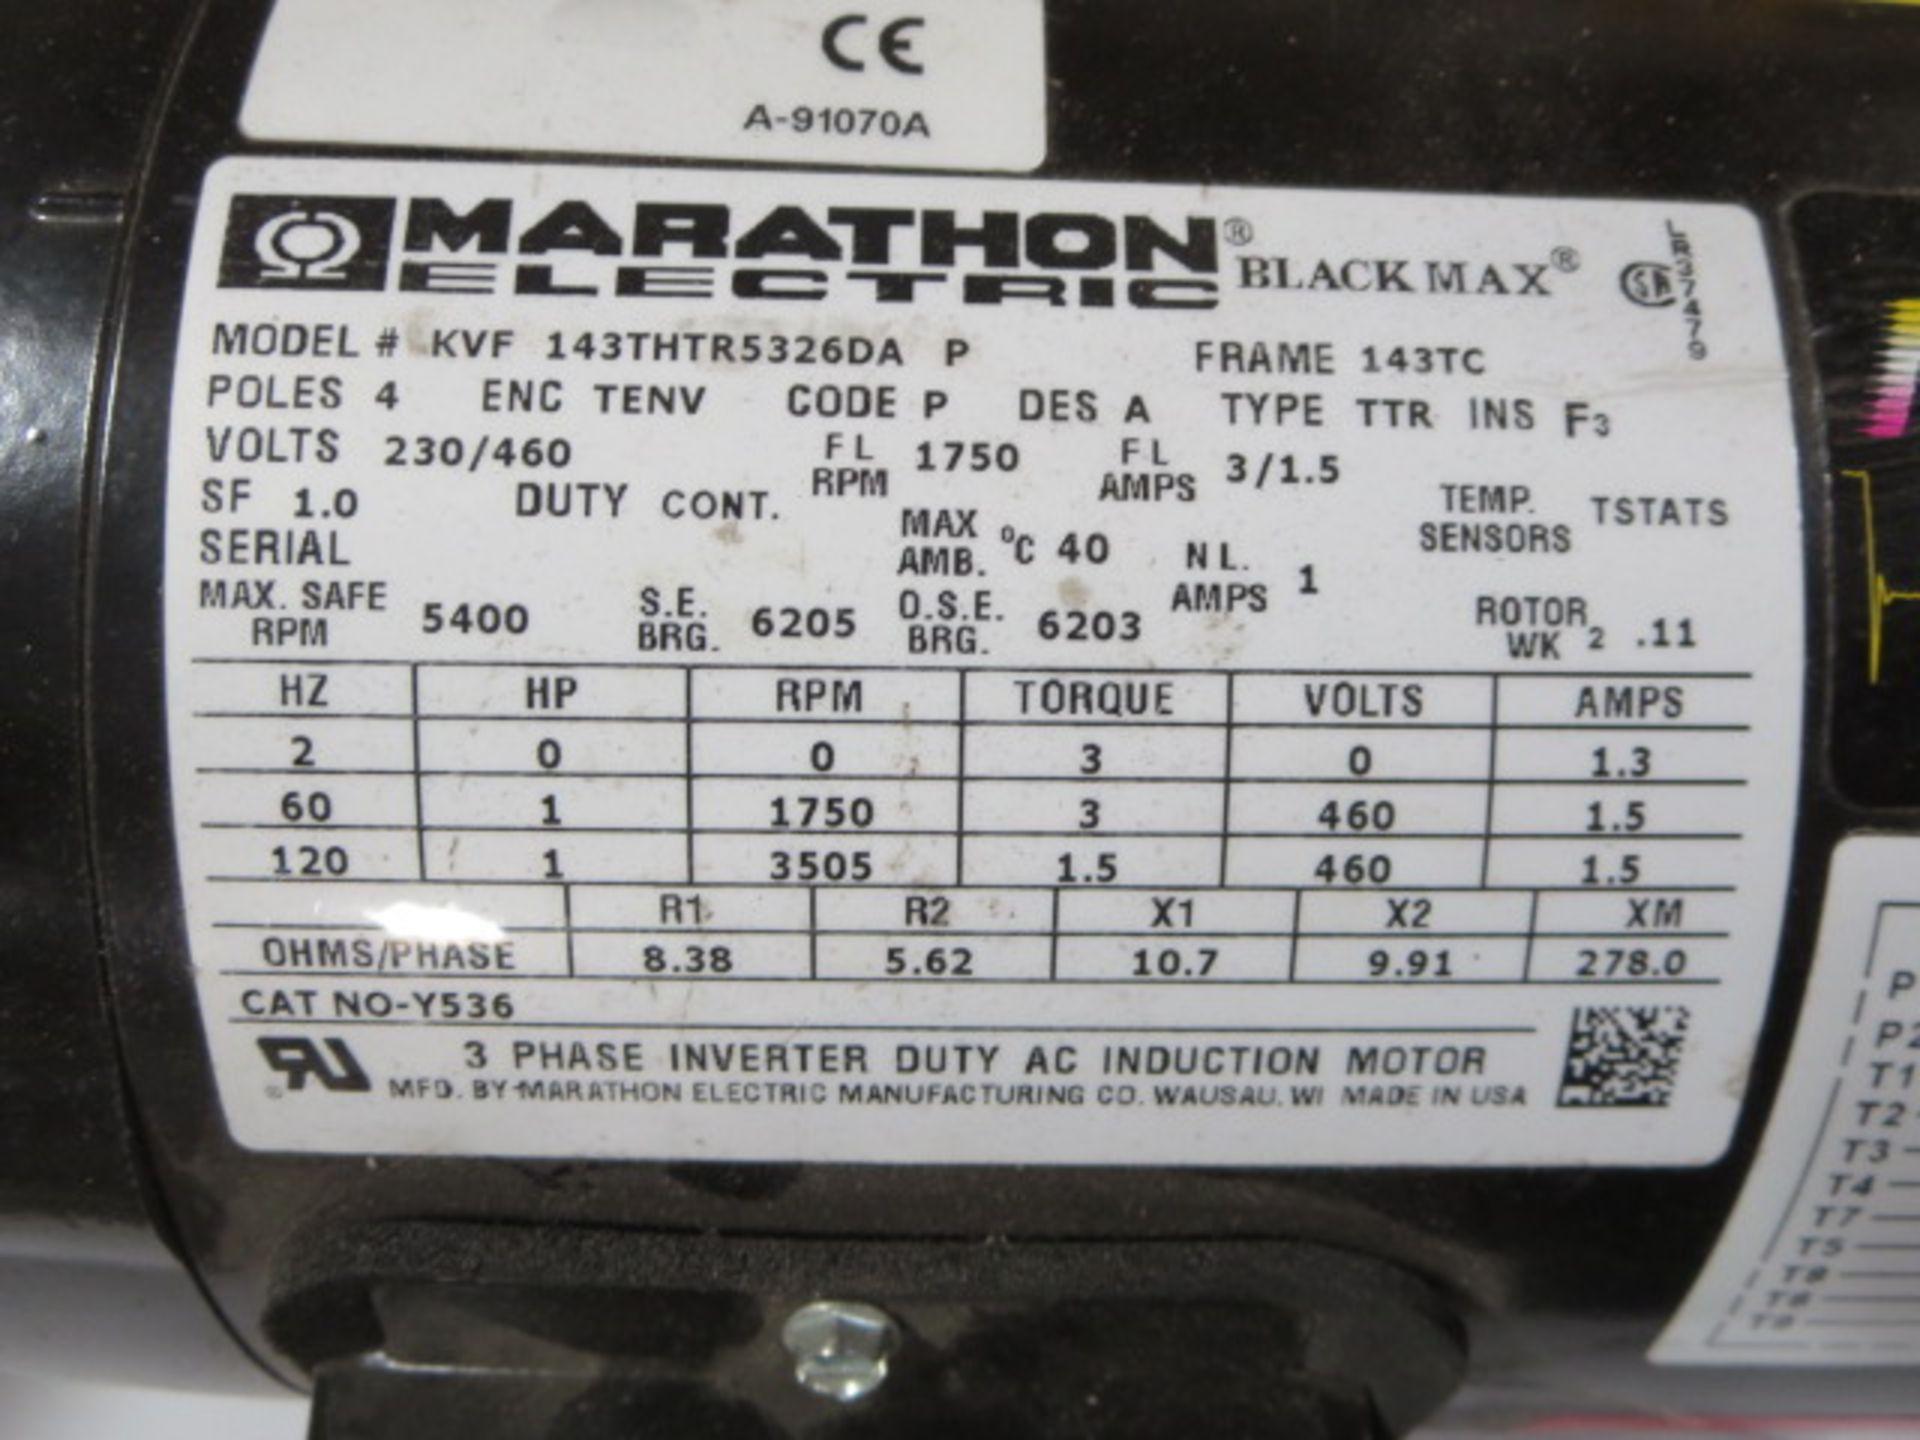 Lot 16 - Marathon Black Max Inverter Duty AC Induction Motor, 3 Phase, 120Hz, model KVF143THTR5326DA P